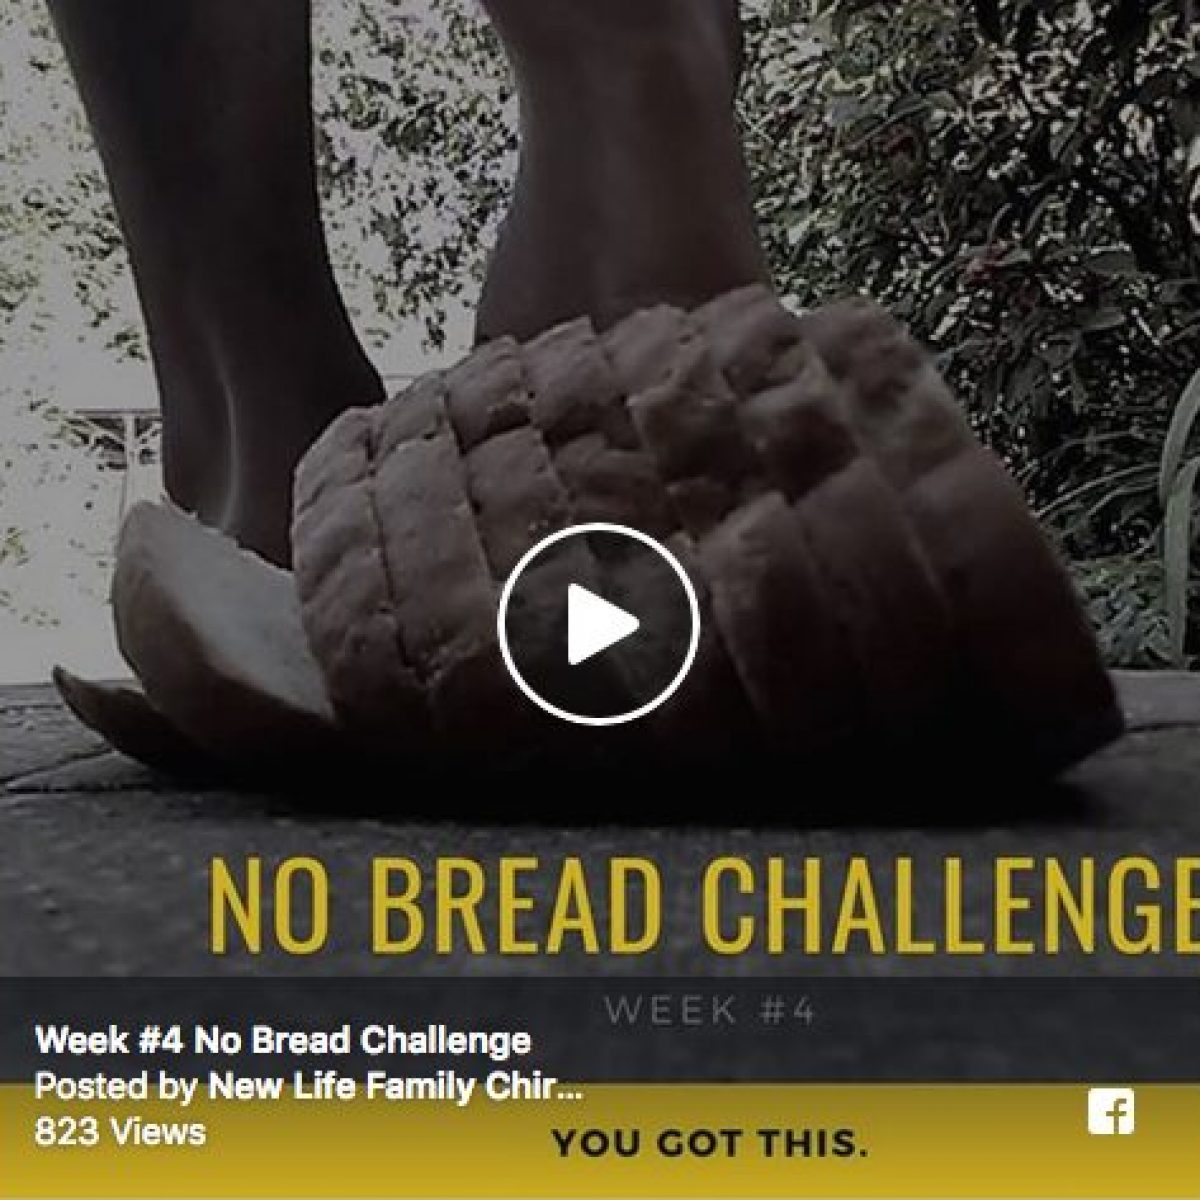 The No Bread Challenge Week #4